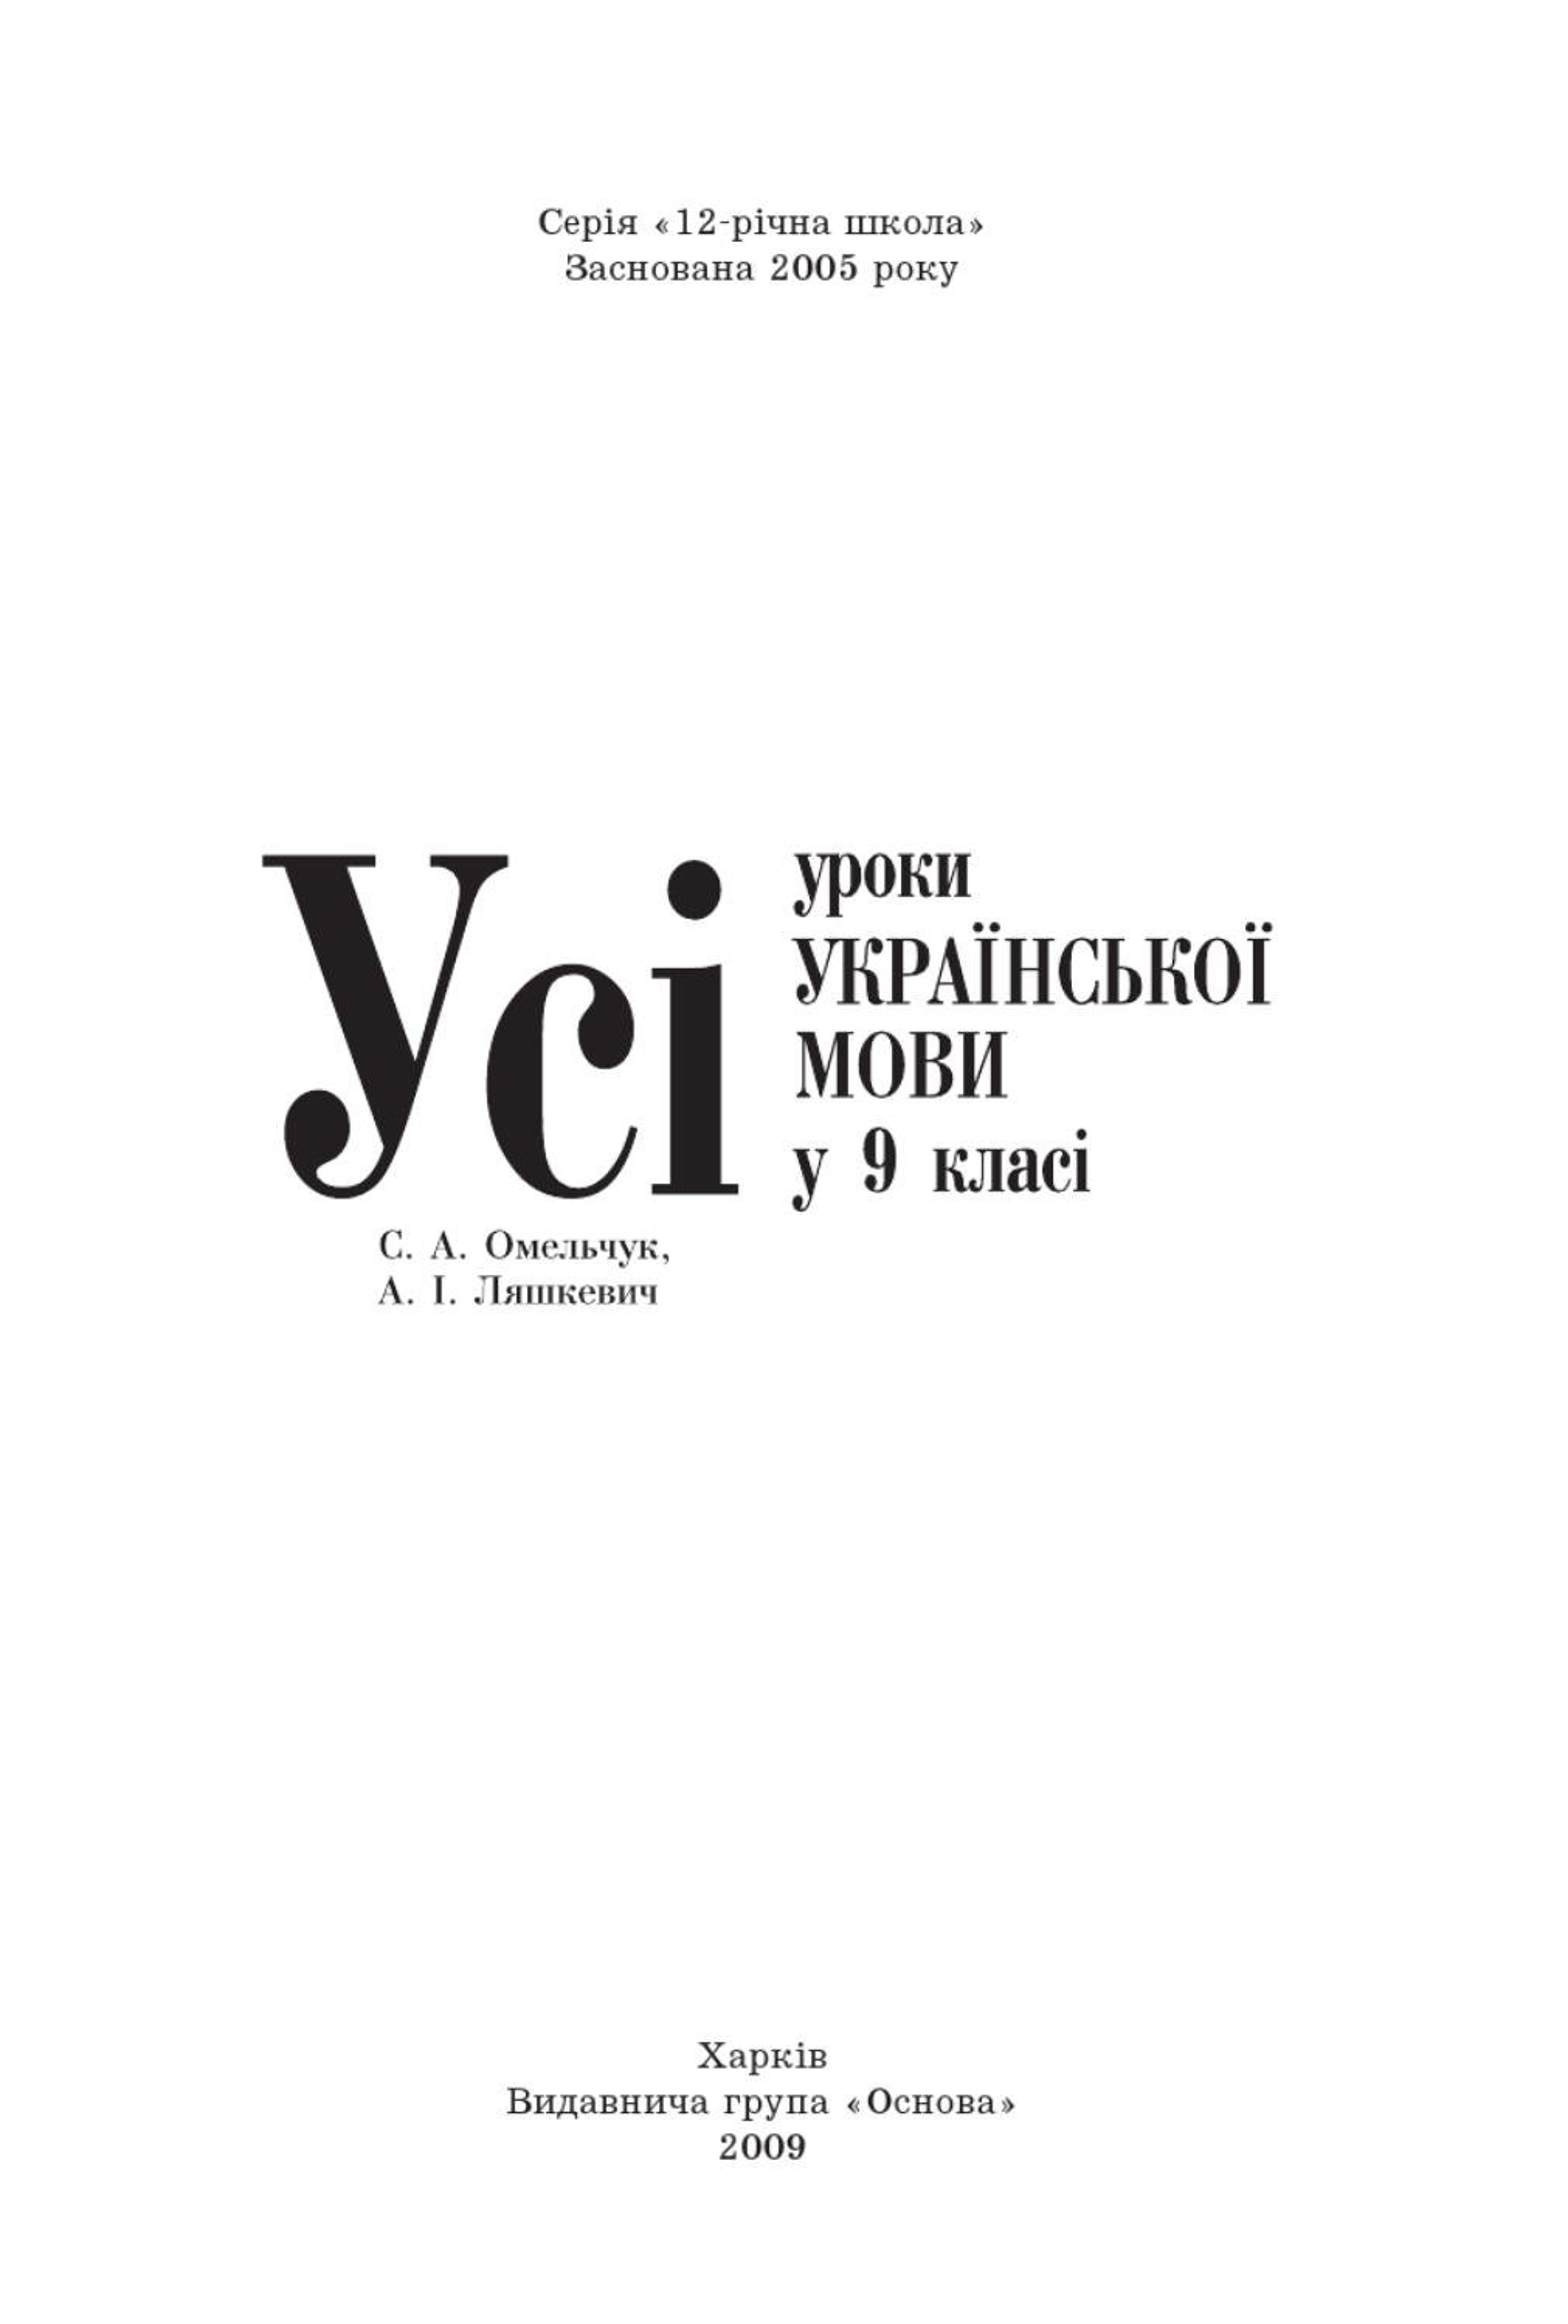 Конспекти з украънської мови для 9 класыв by Jarik Exe - issuu e2fafb5c17f20